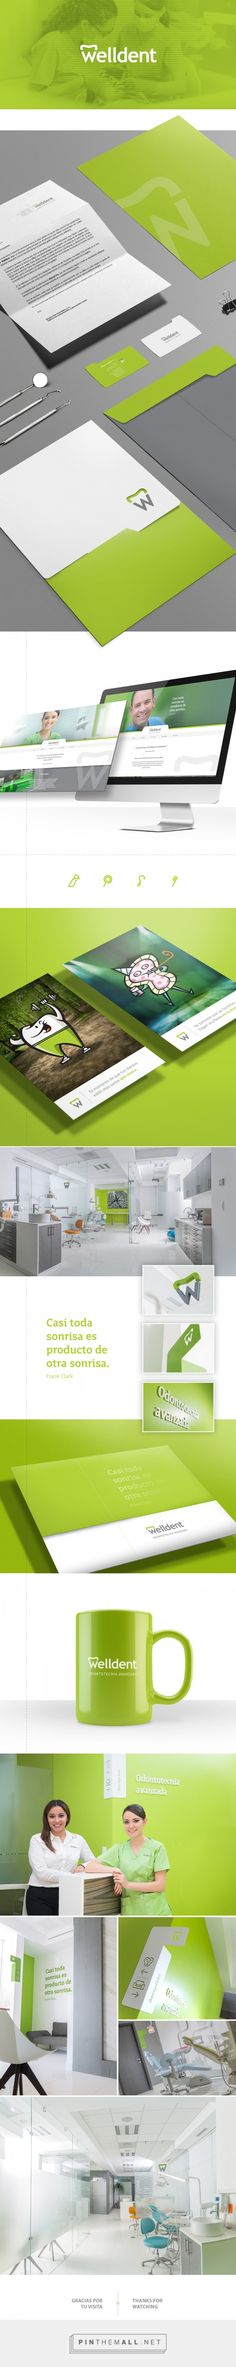 Welldent, dentist brand identity by Diseño Dos Asociados #branding #stationary…